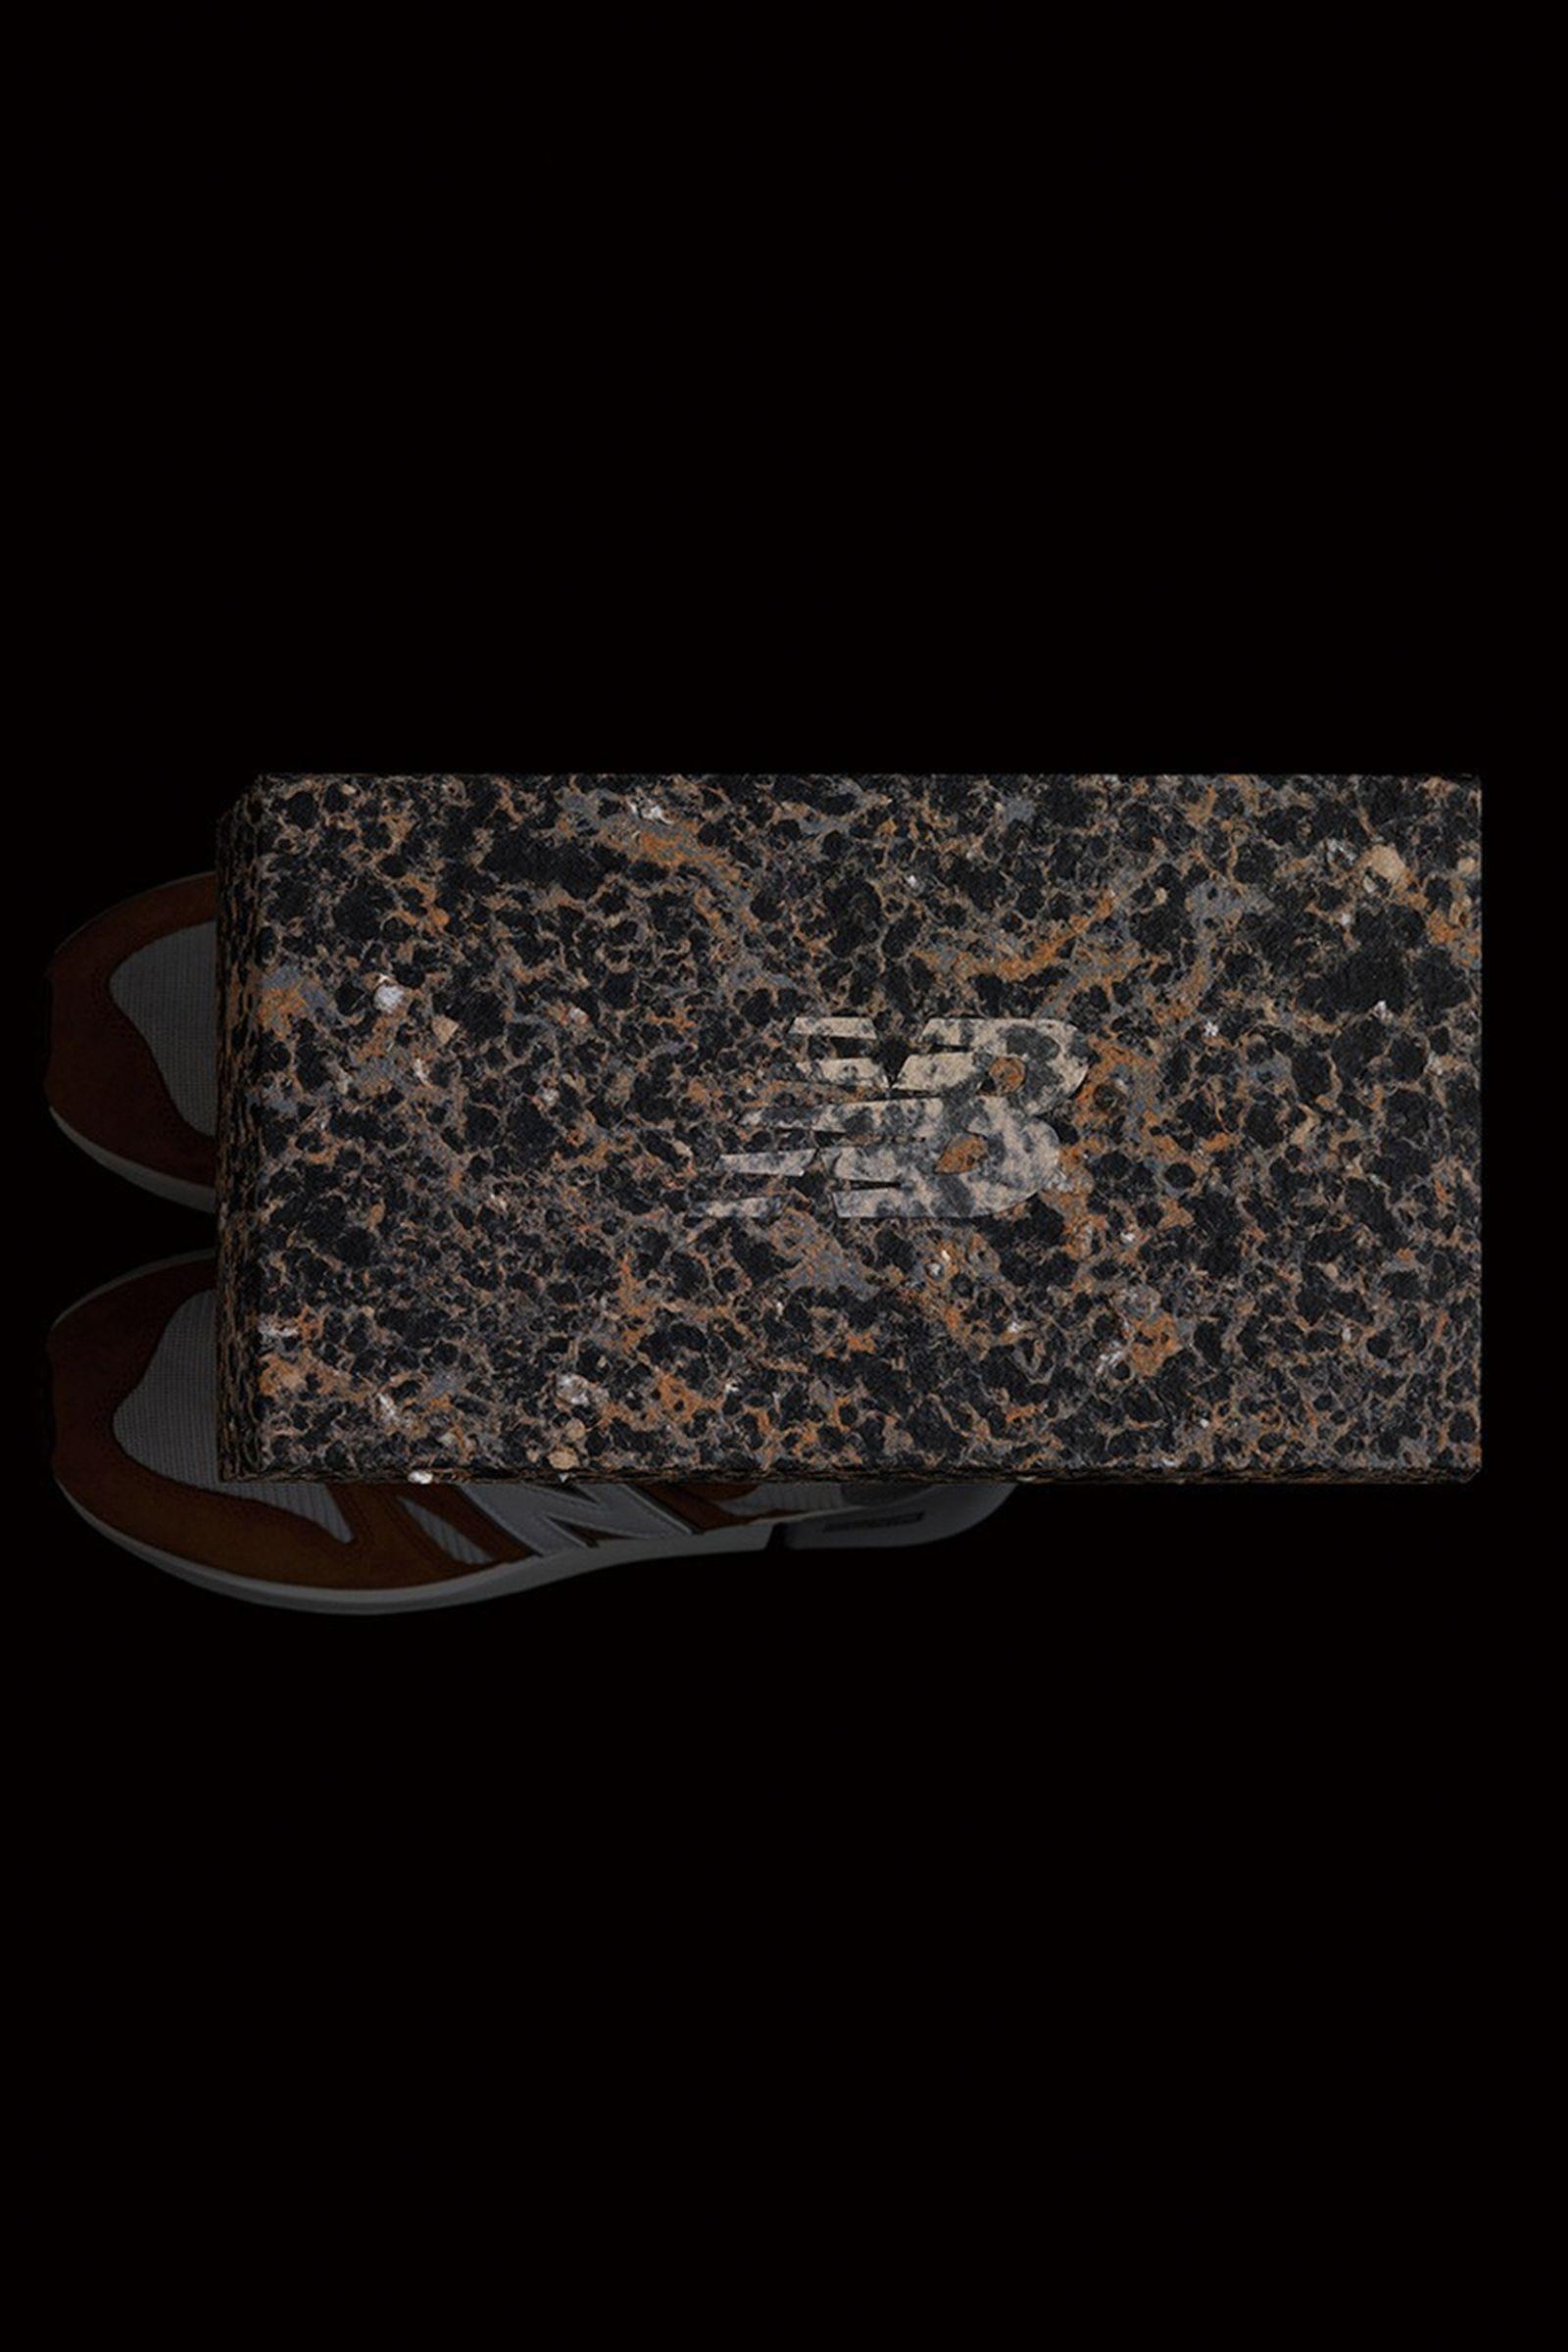 yoshihisa-tanaka-new-balance-shoebox-05